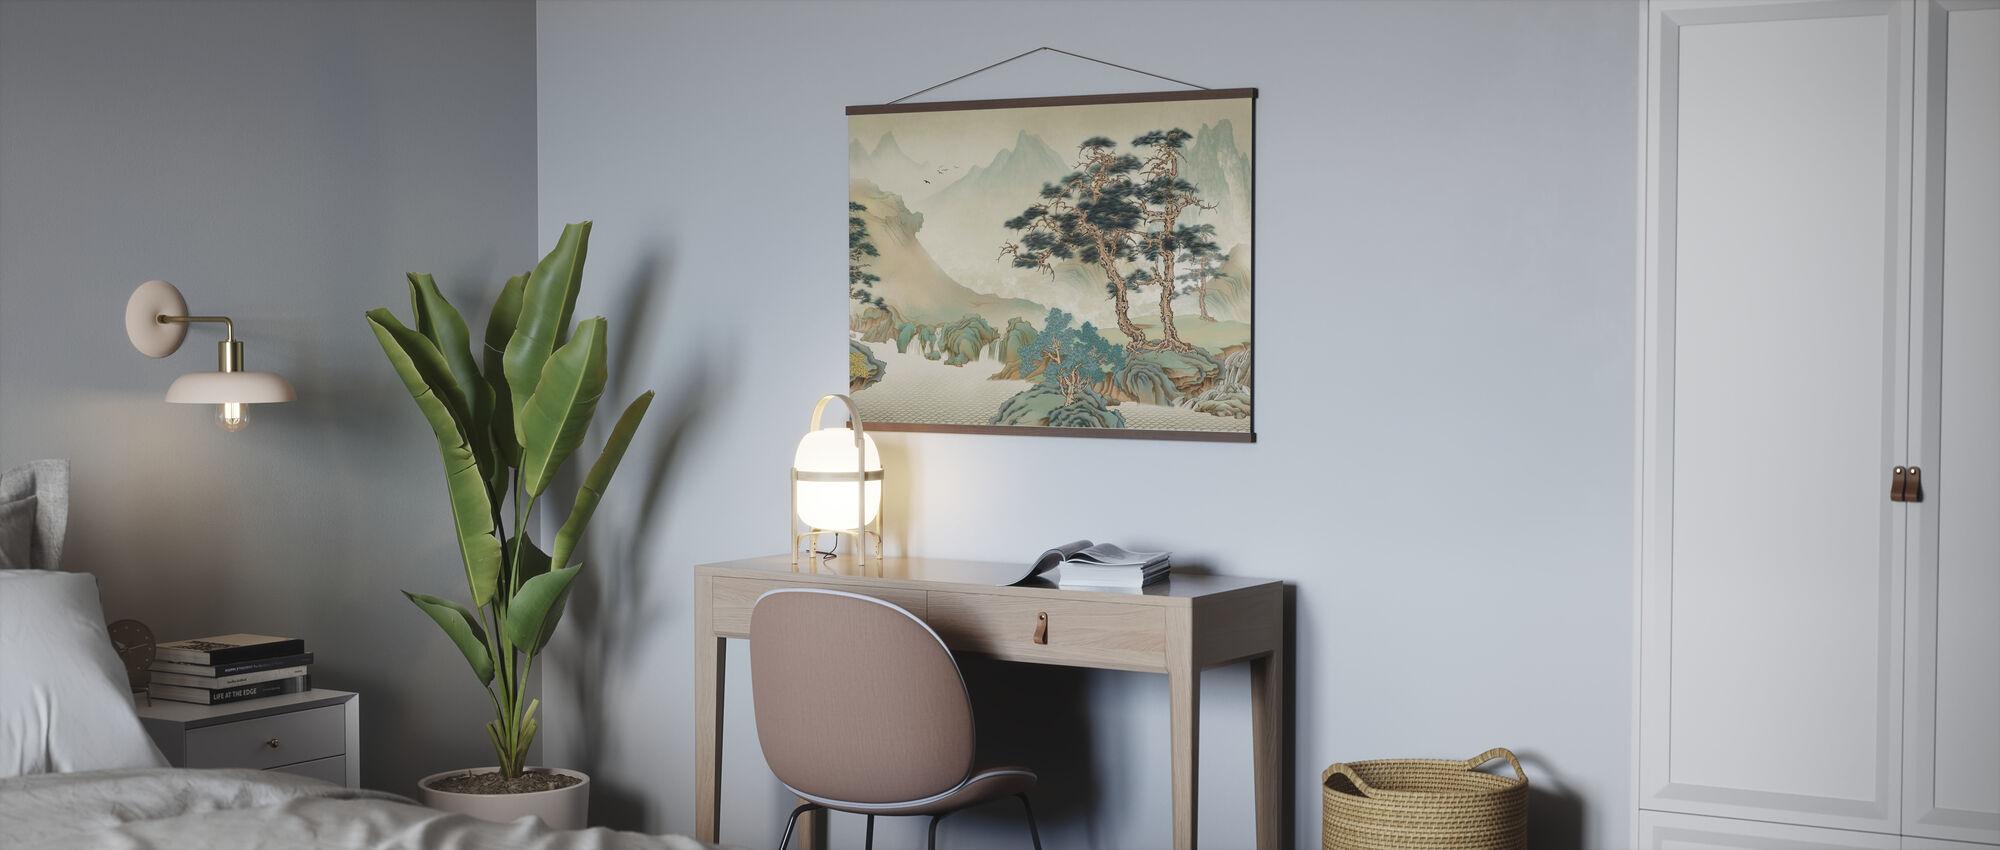 Jiangs Landscape - Poster - Office